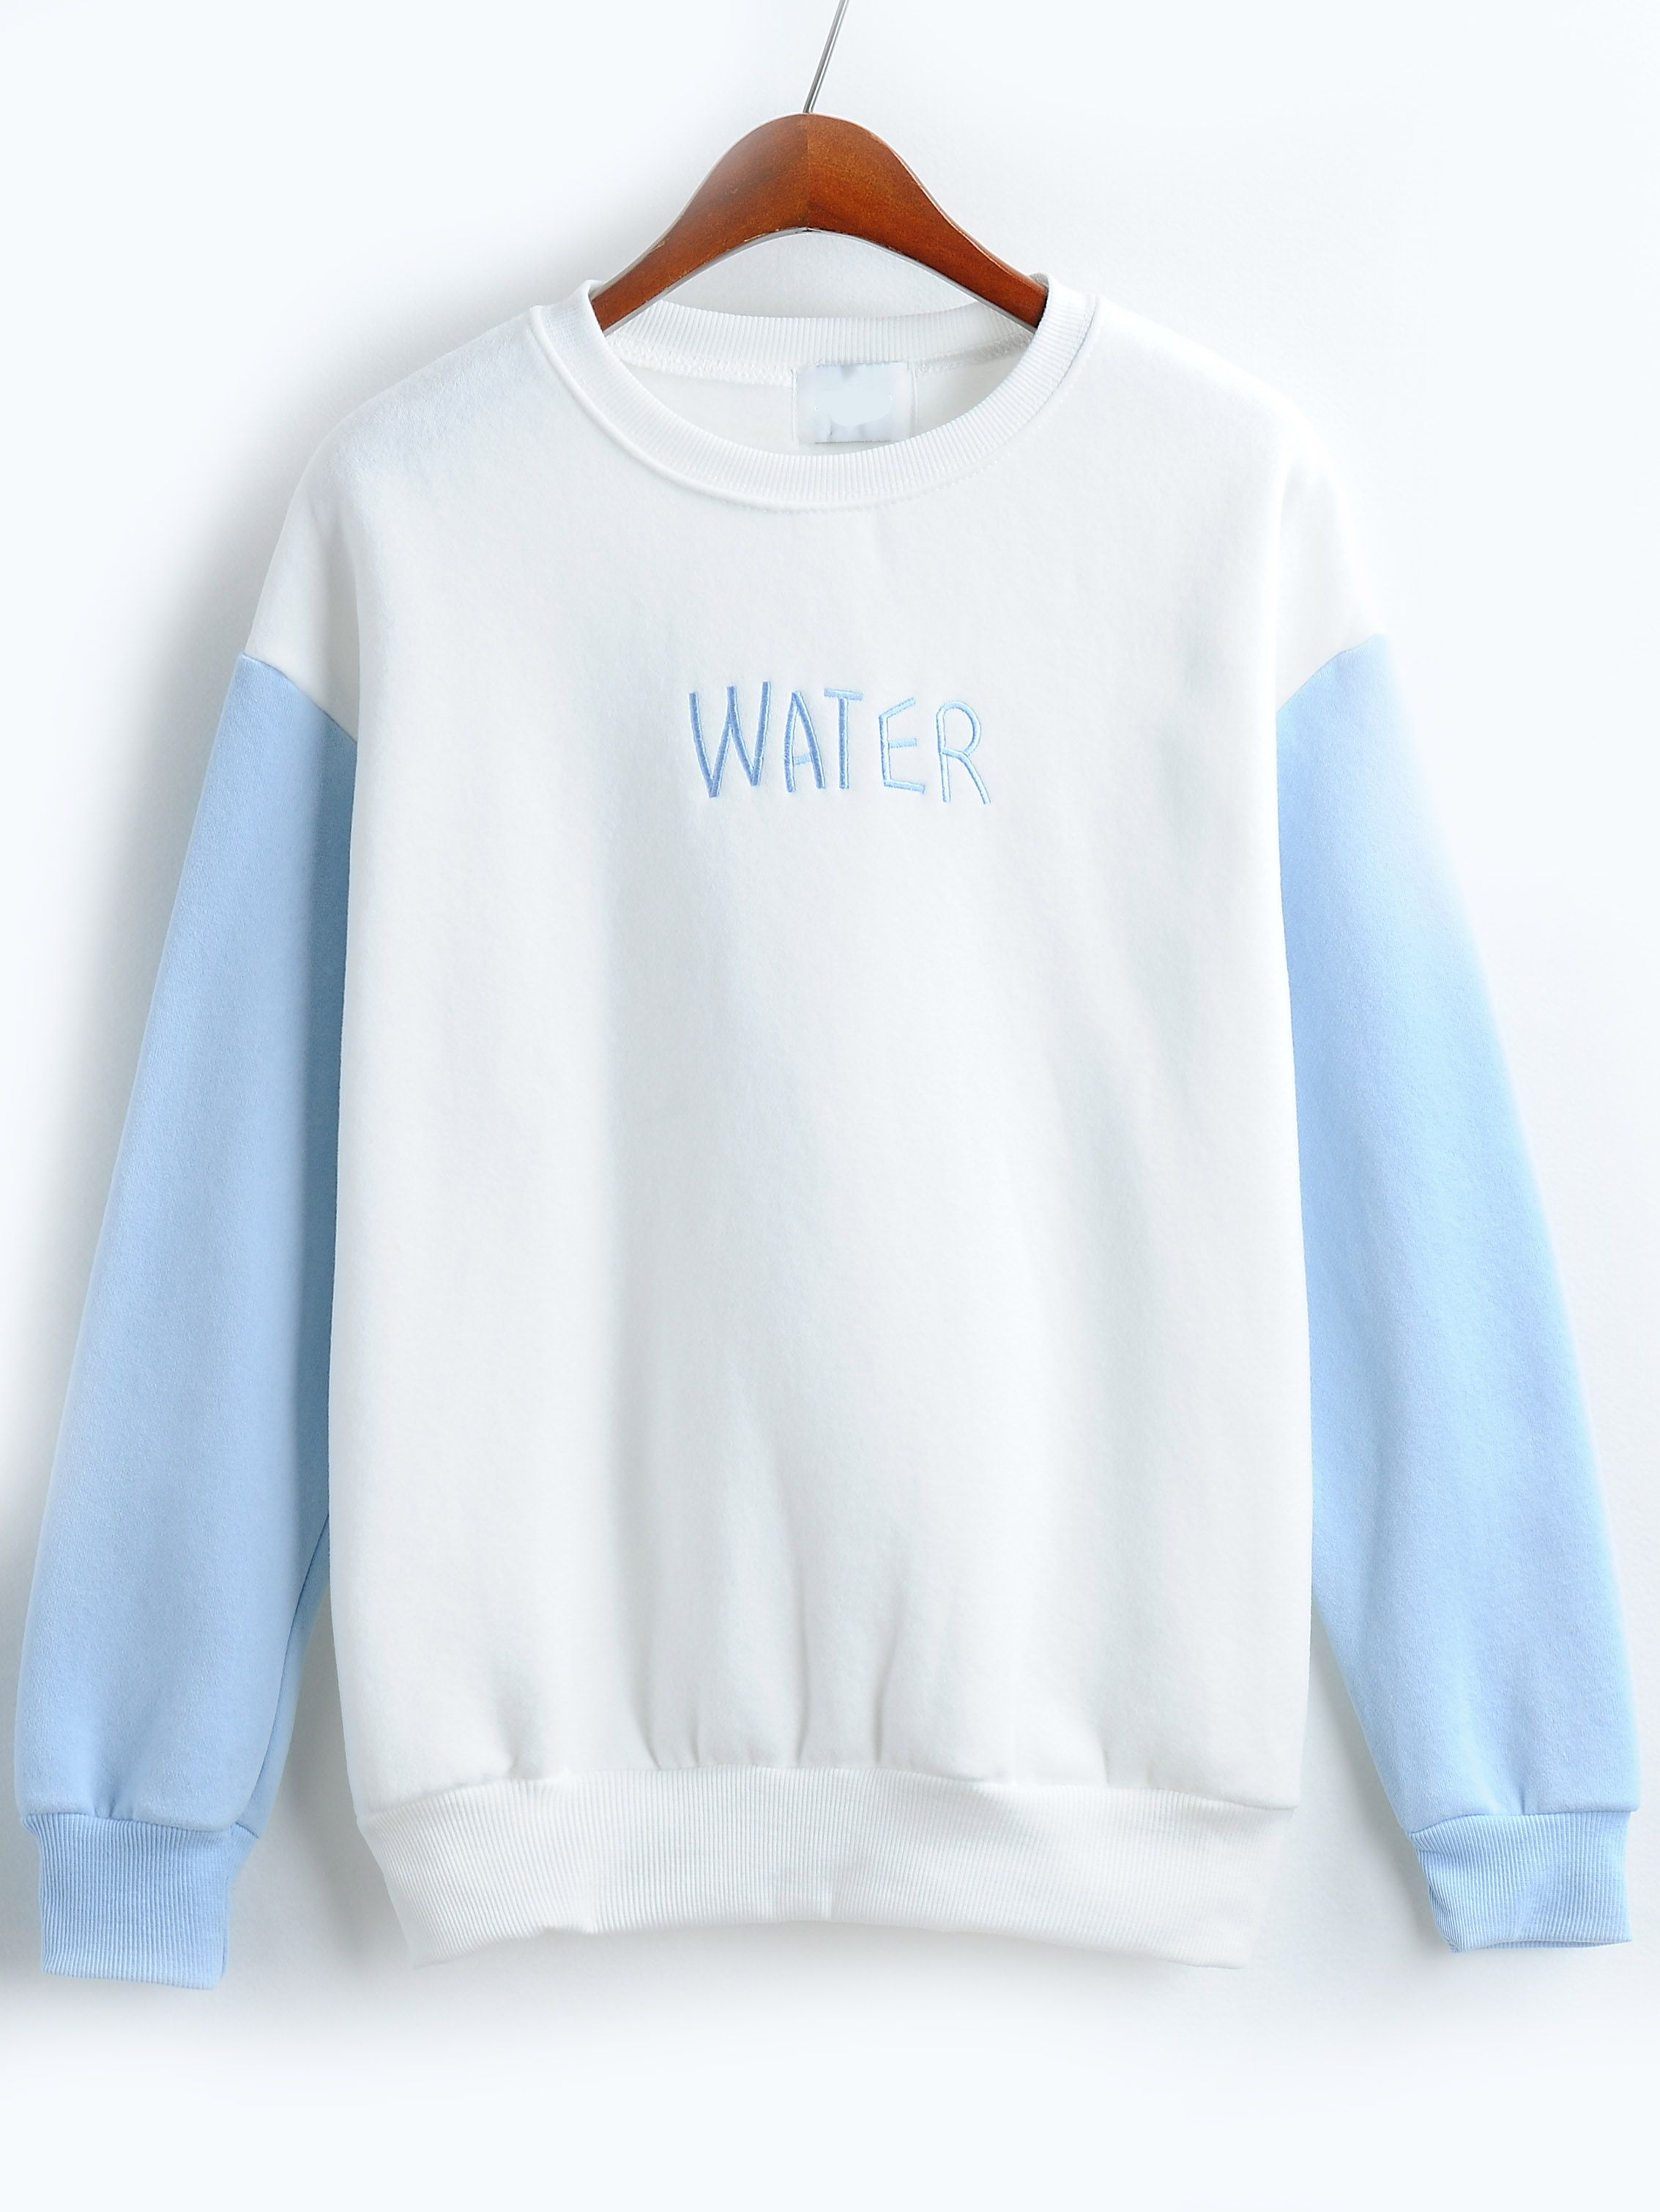 Letter Embroidered Loose Blue White Sweatshirt Hoodie Fashion Sweatshirts Trendy Hoodies [ 3020 x 2267 Pixel ]